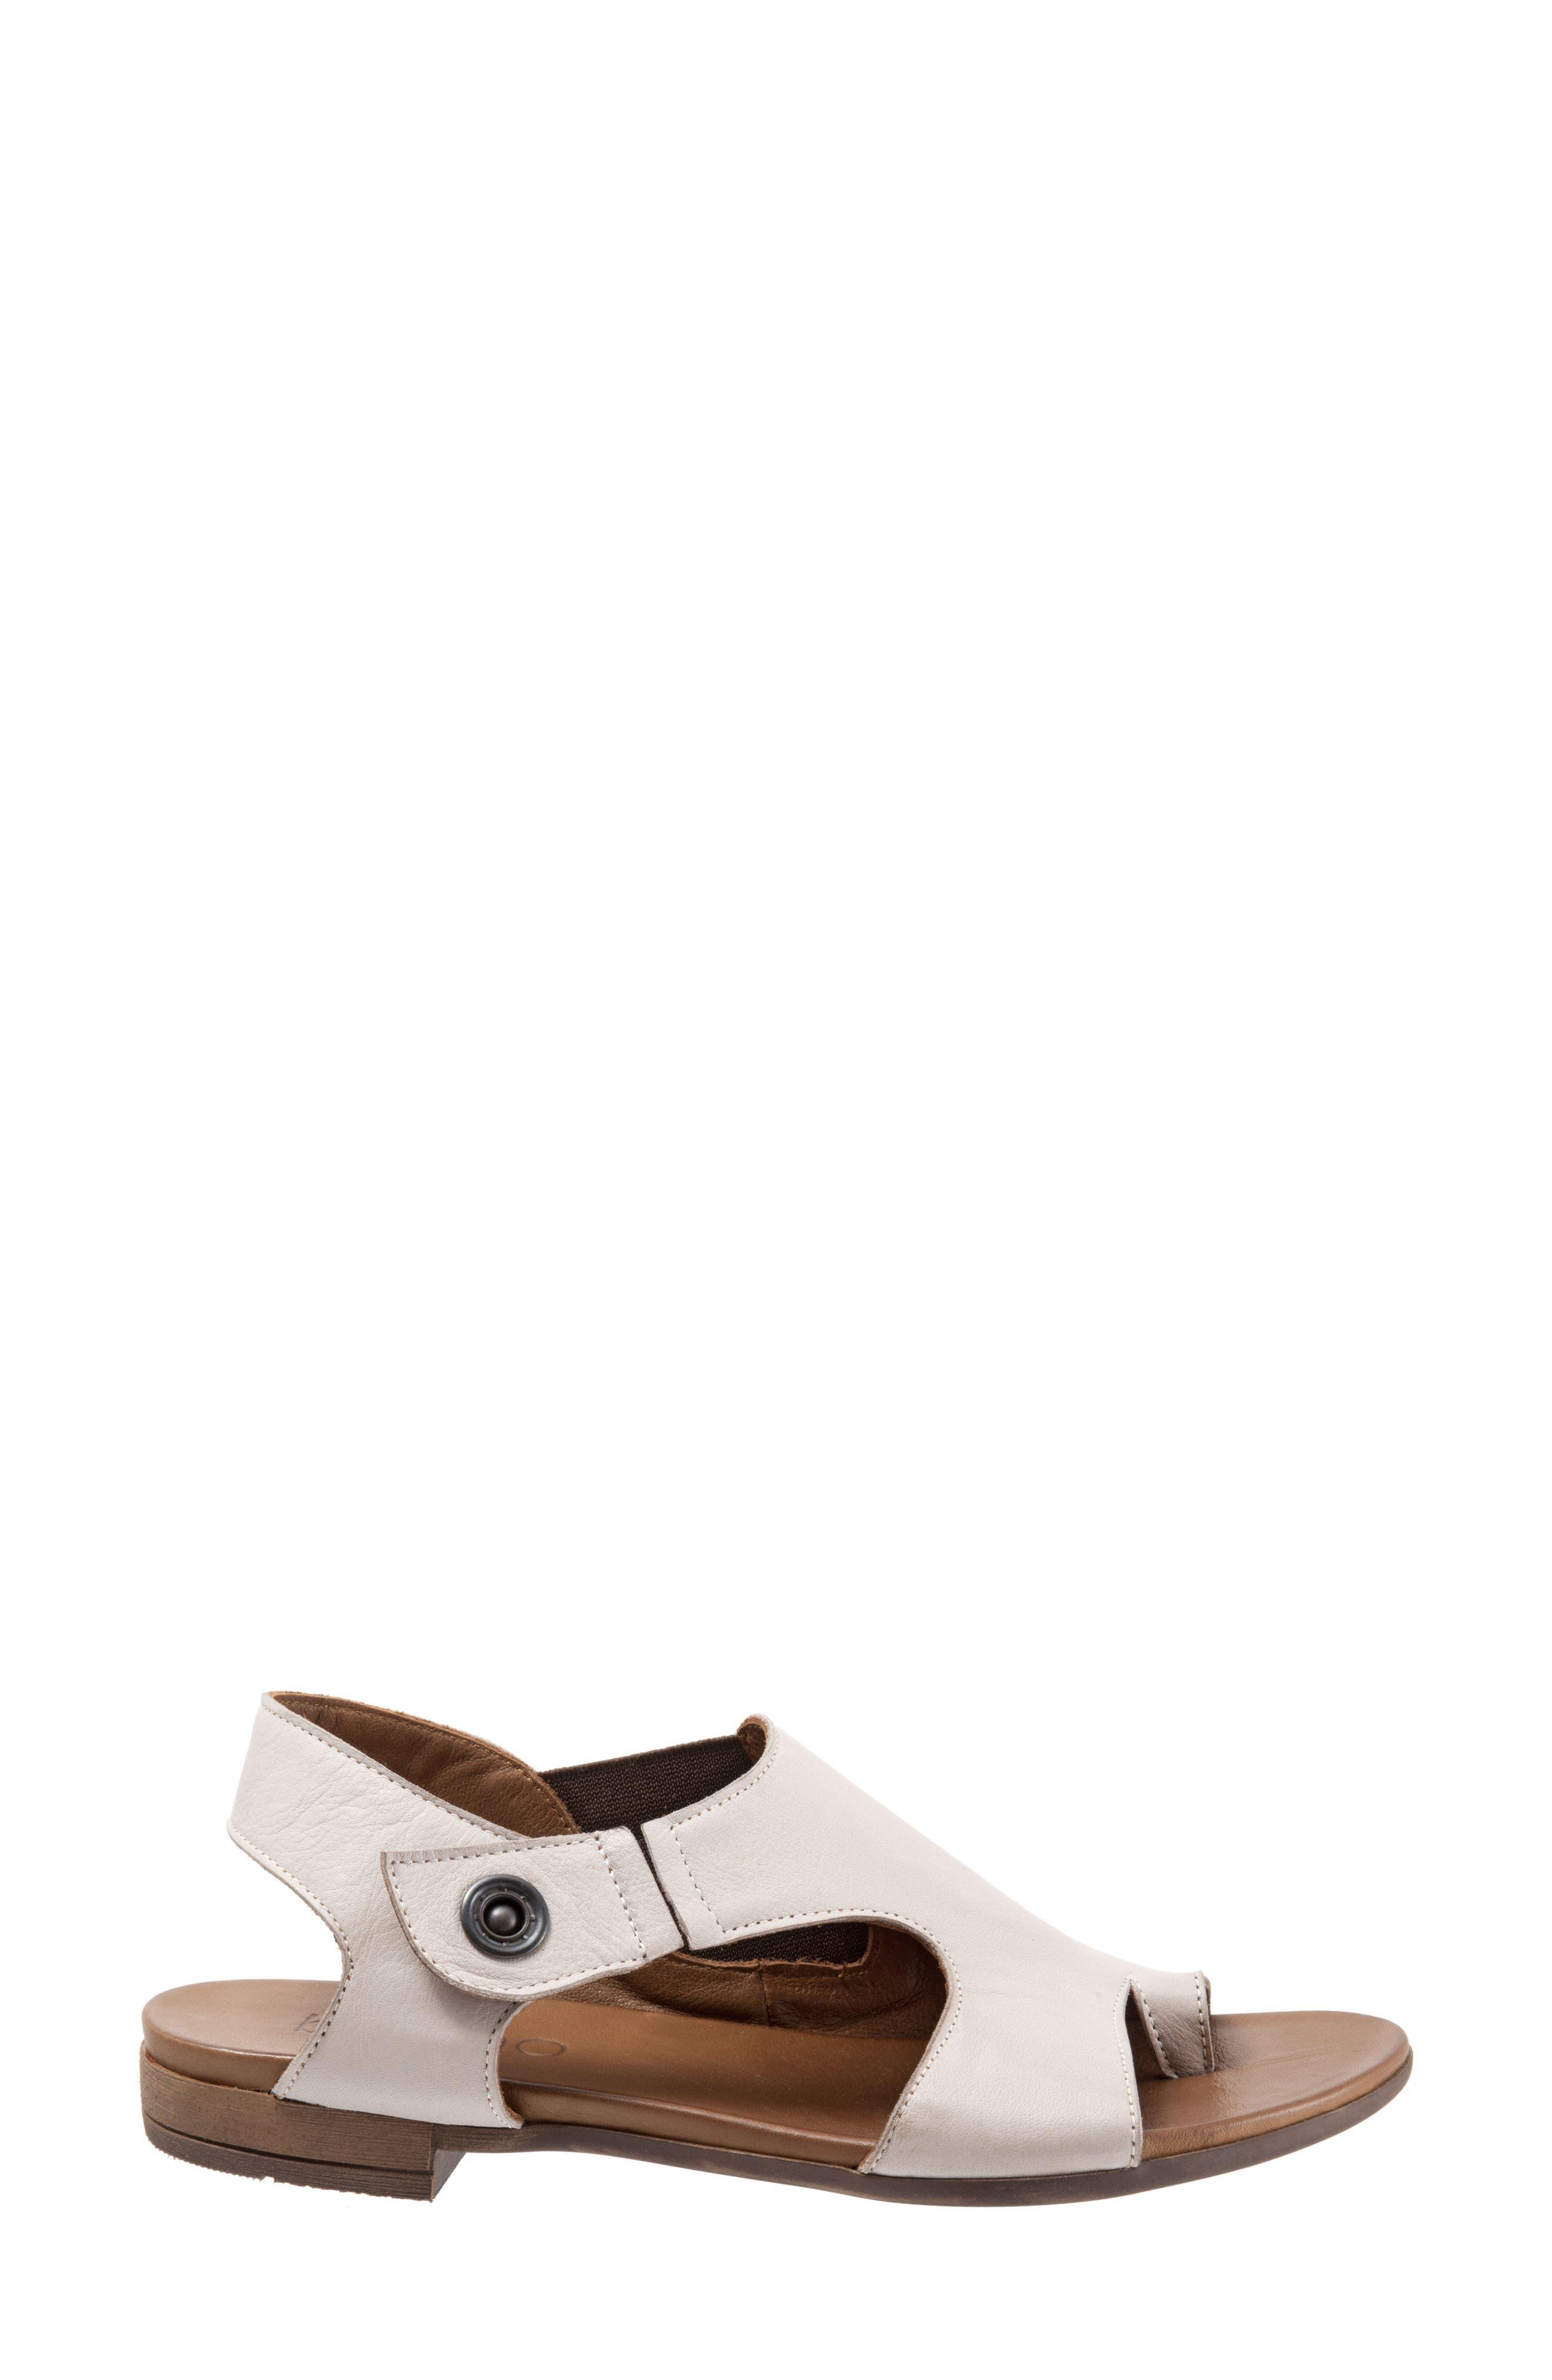 Tessa Sandal,                             Alternate thumbnail 3, color,                             Light Grey Leather